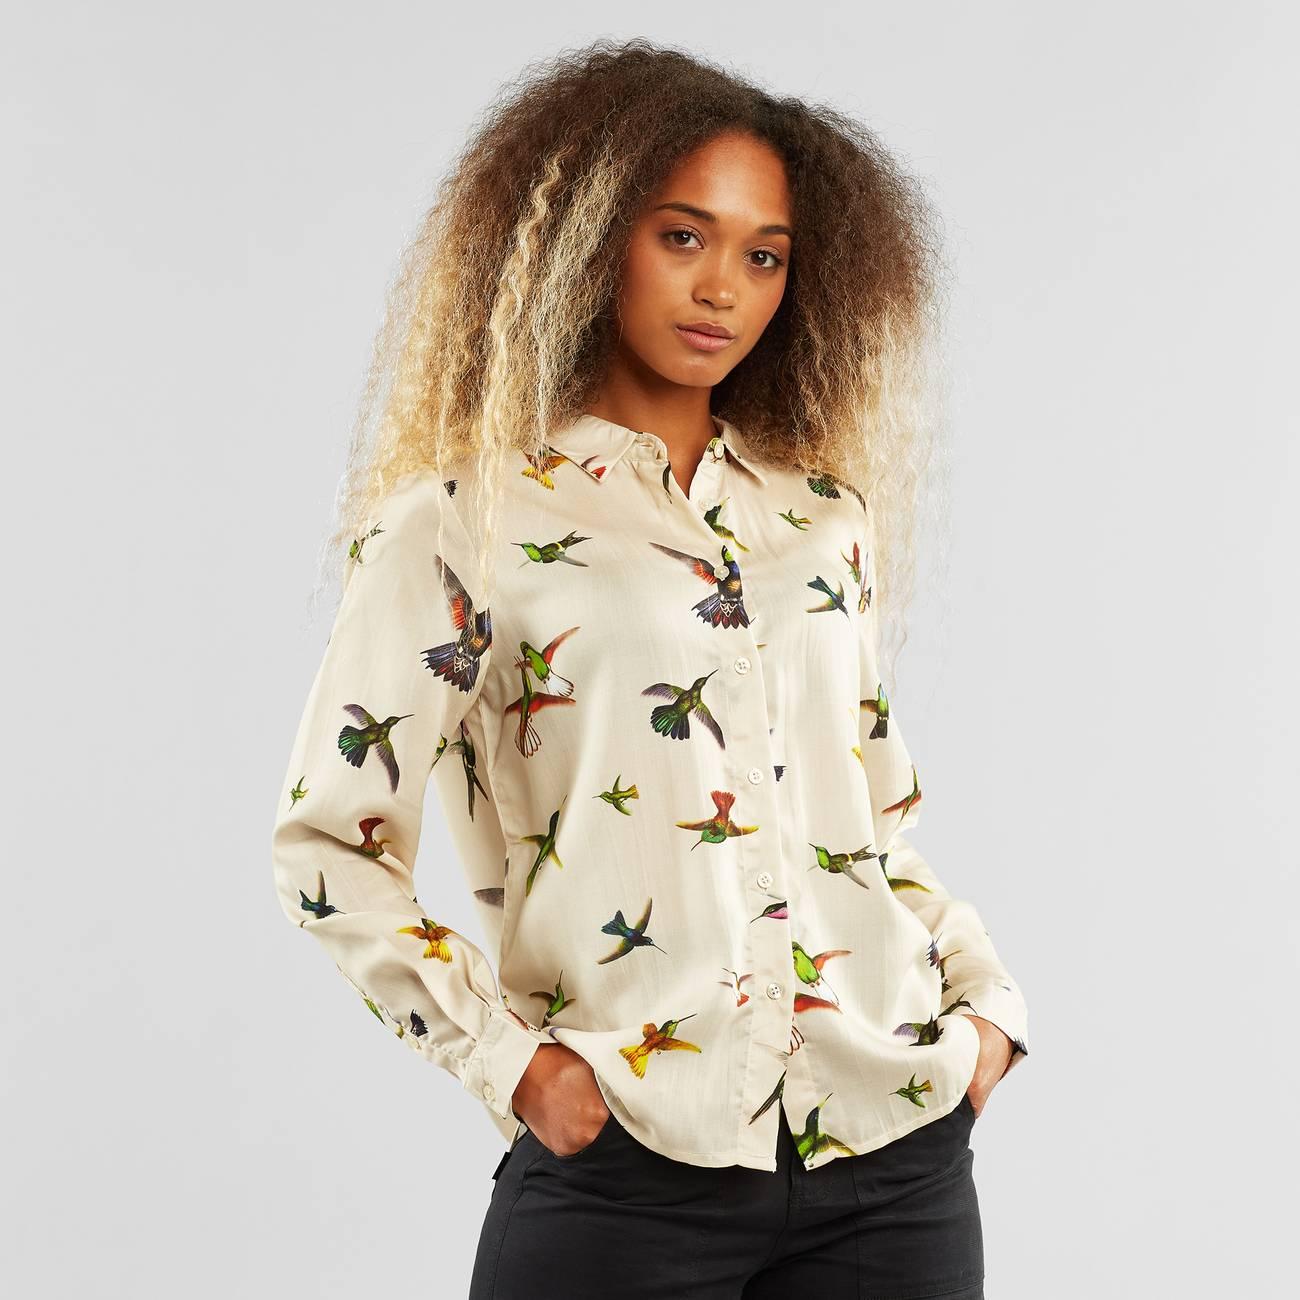 Shirt Dorothea Floral Hummingbirds Multi Color